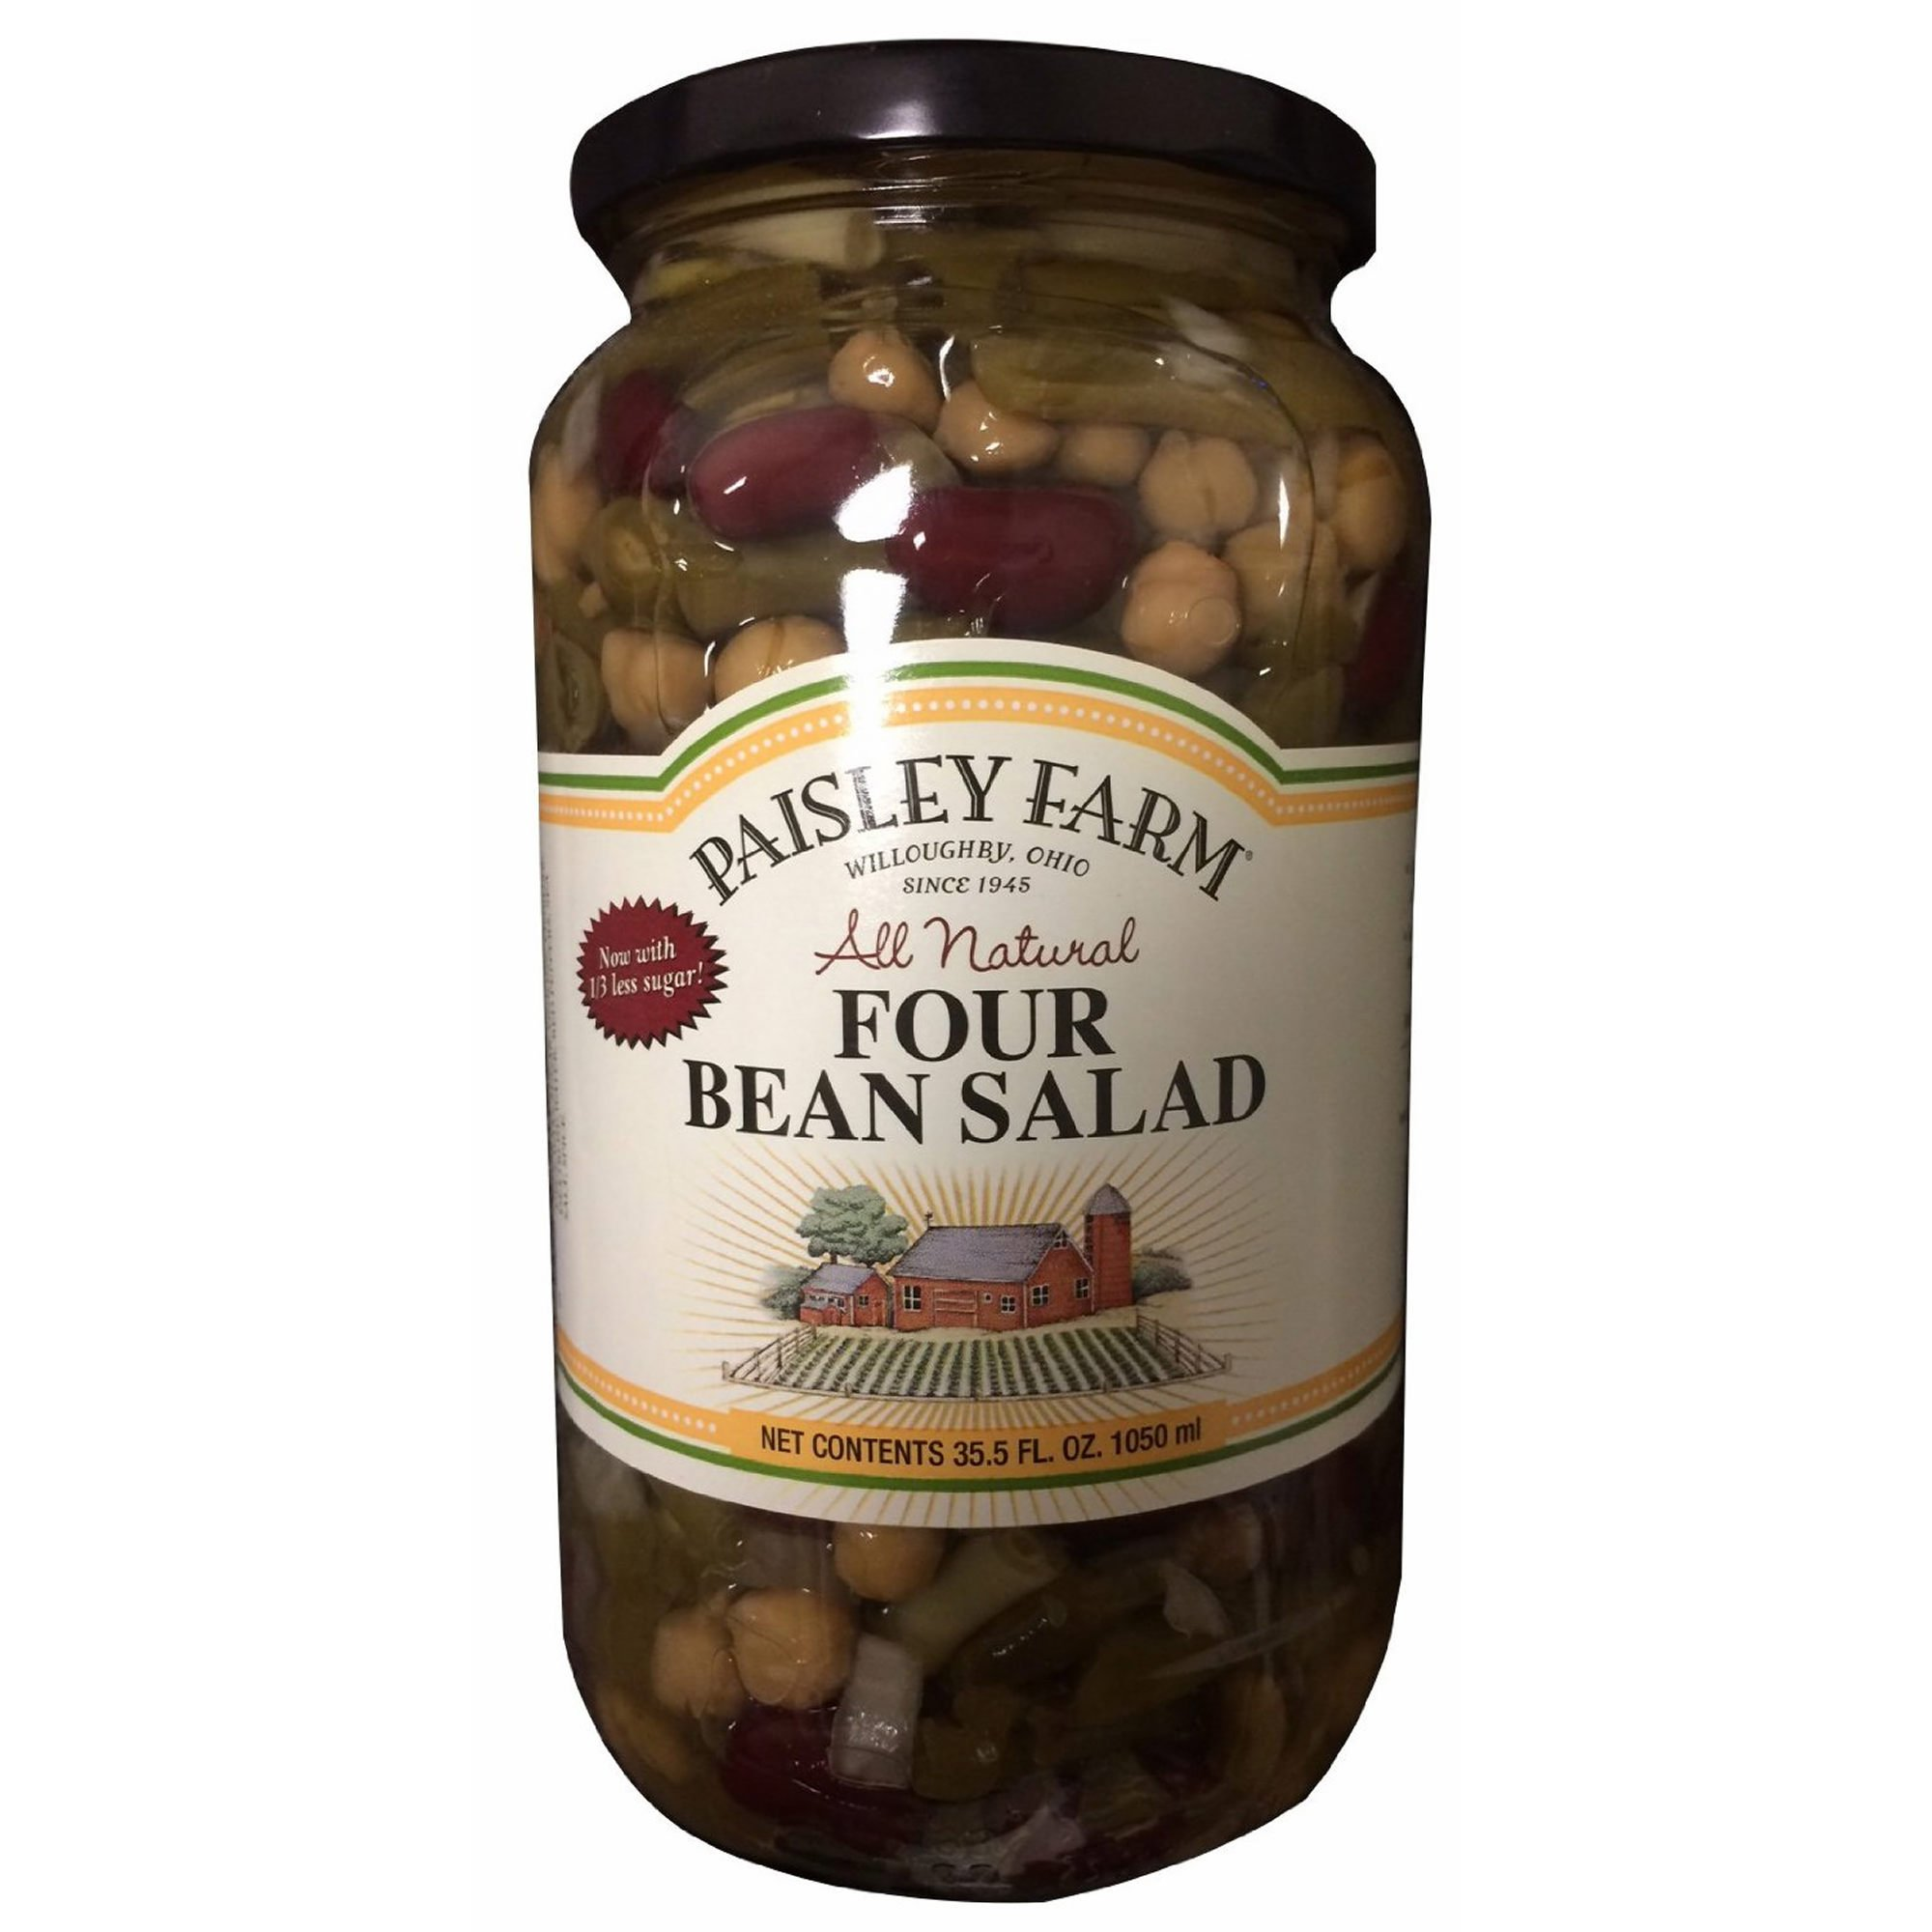 Paisley Farm Natural Four Bean Salad, 2 ct./35.5 oz. (pack of 2)